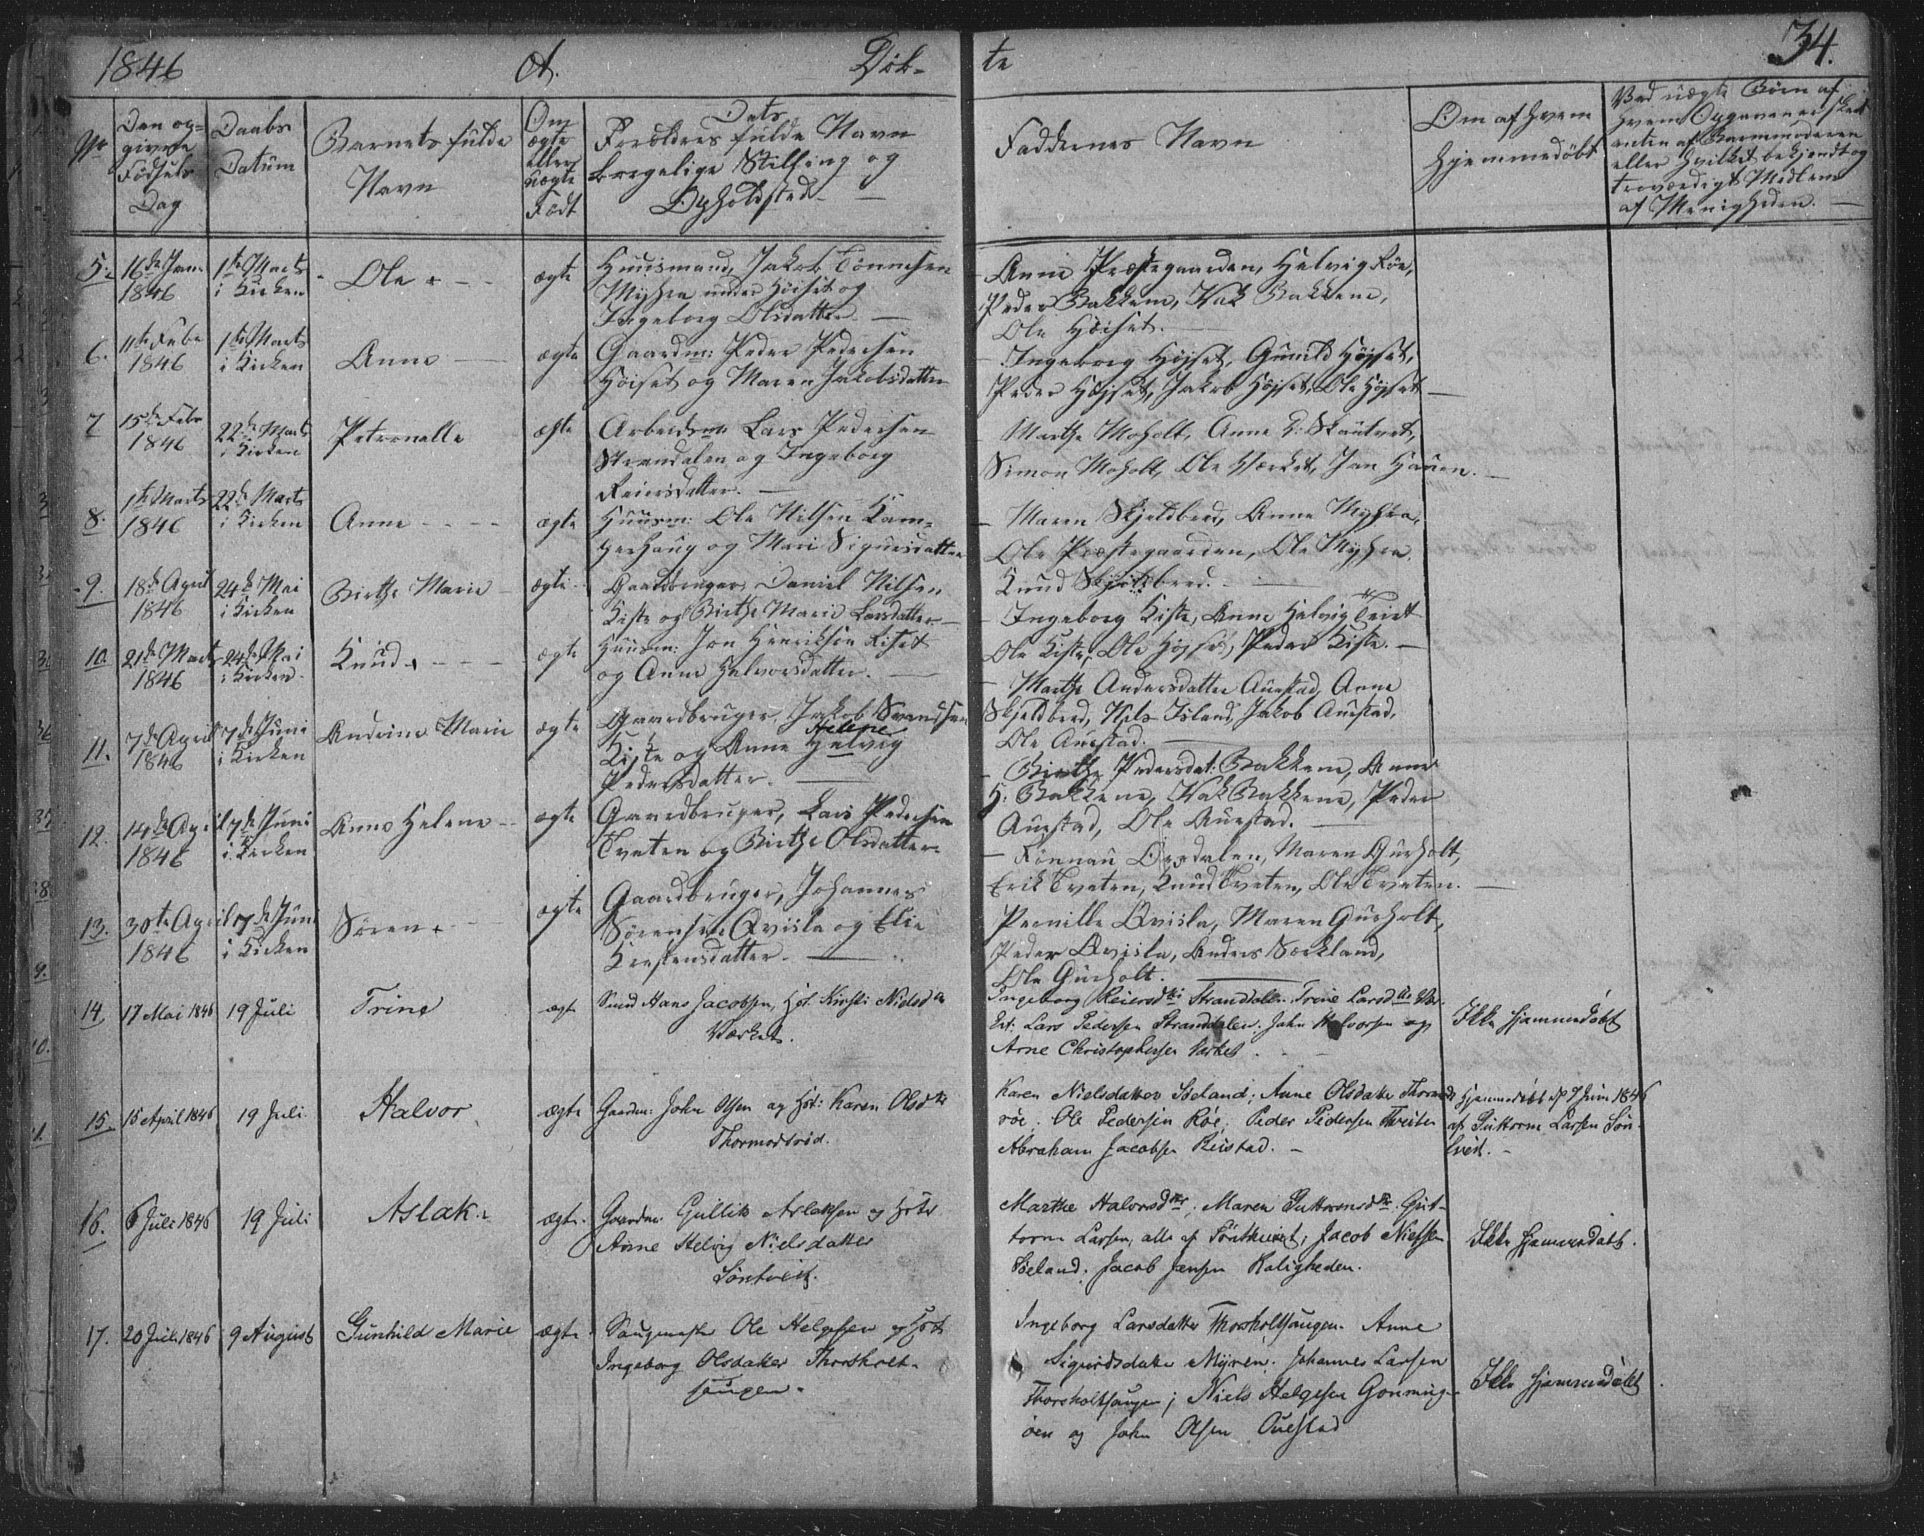 SAKO, Siljan kirkebøker, F/Fa/L0001: Parish register (official) no. 1, 1831-1870, p. 34